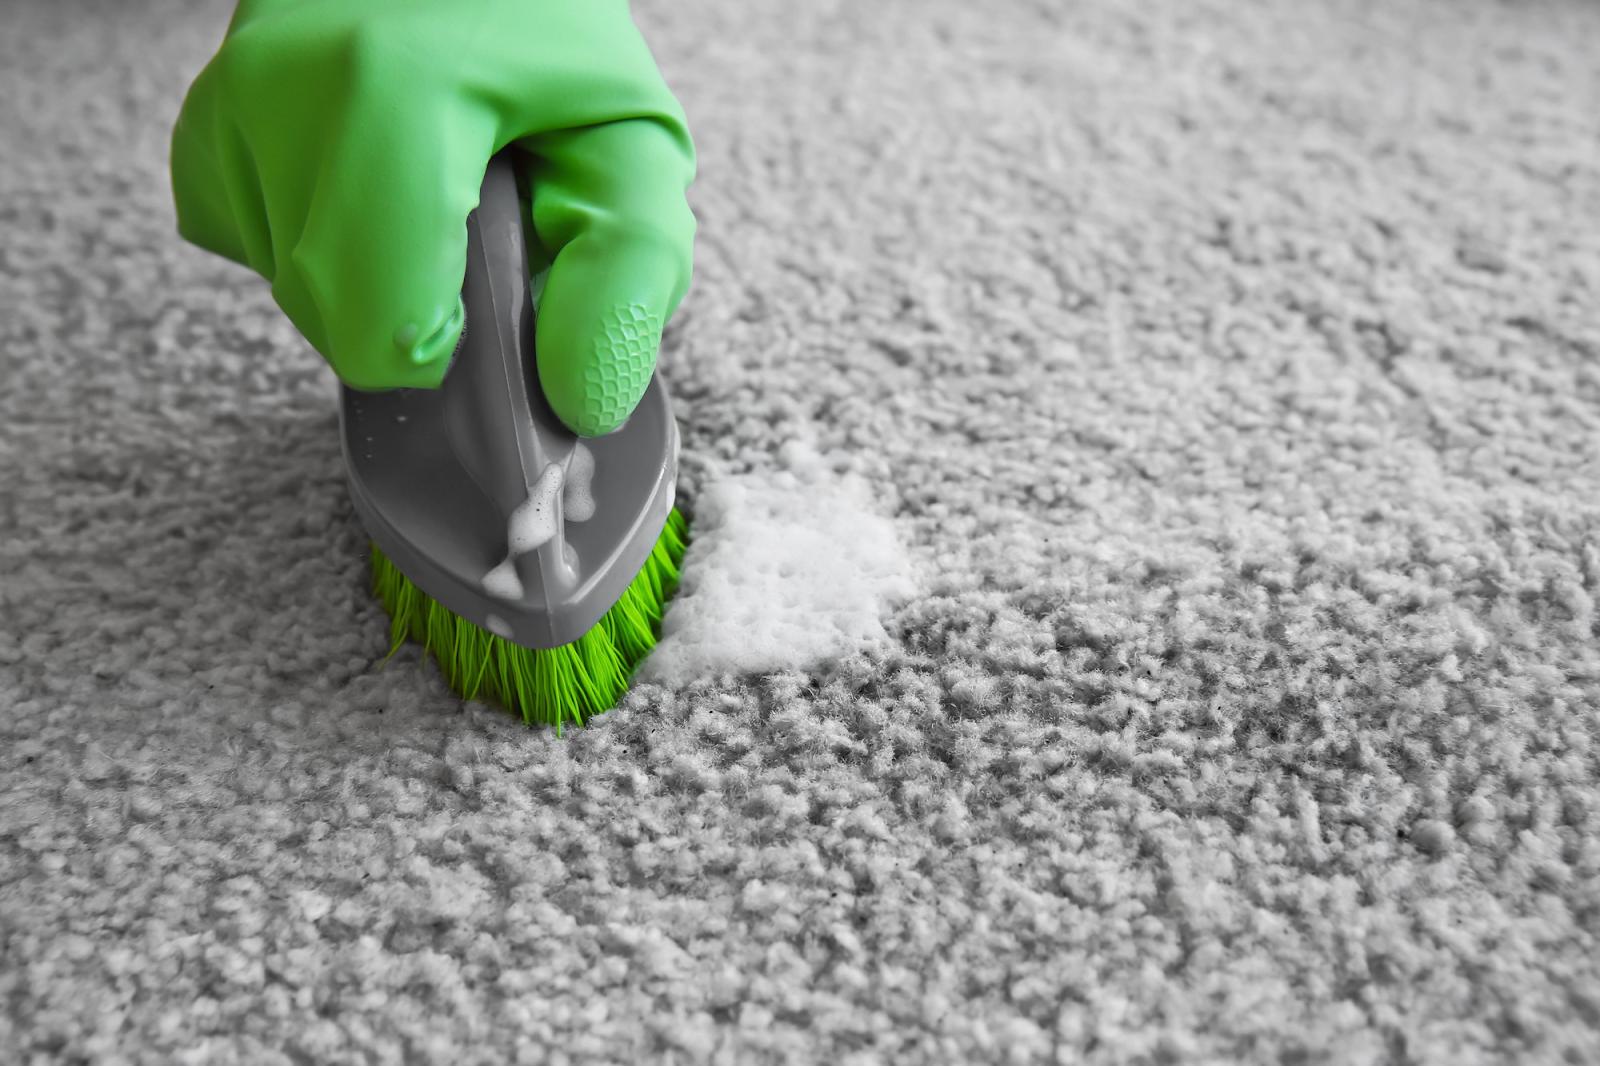 close up photo of brushing the carpet